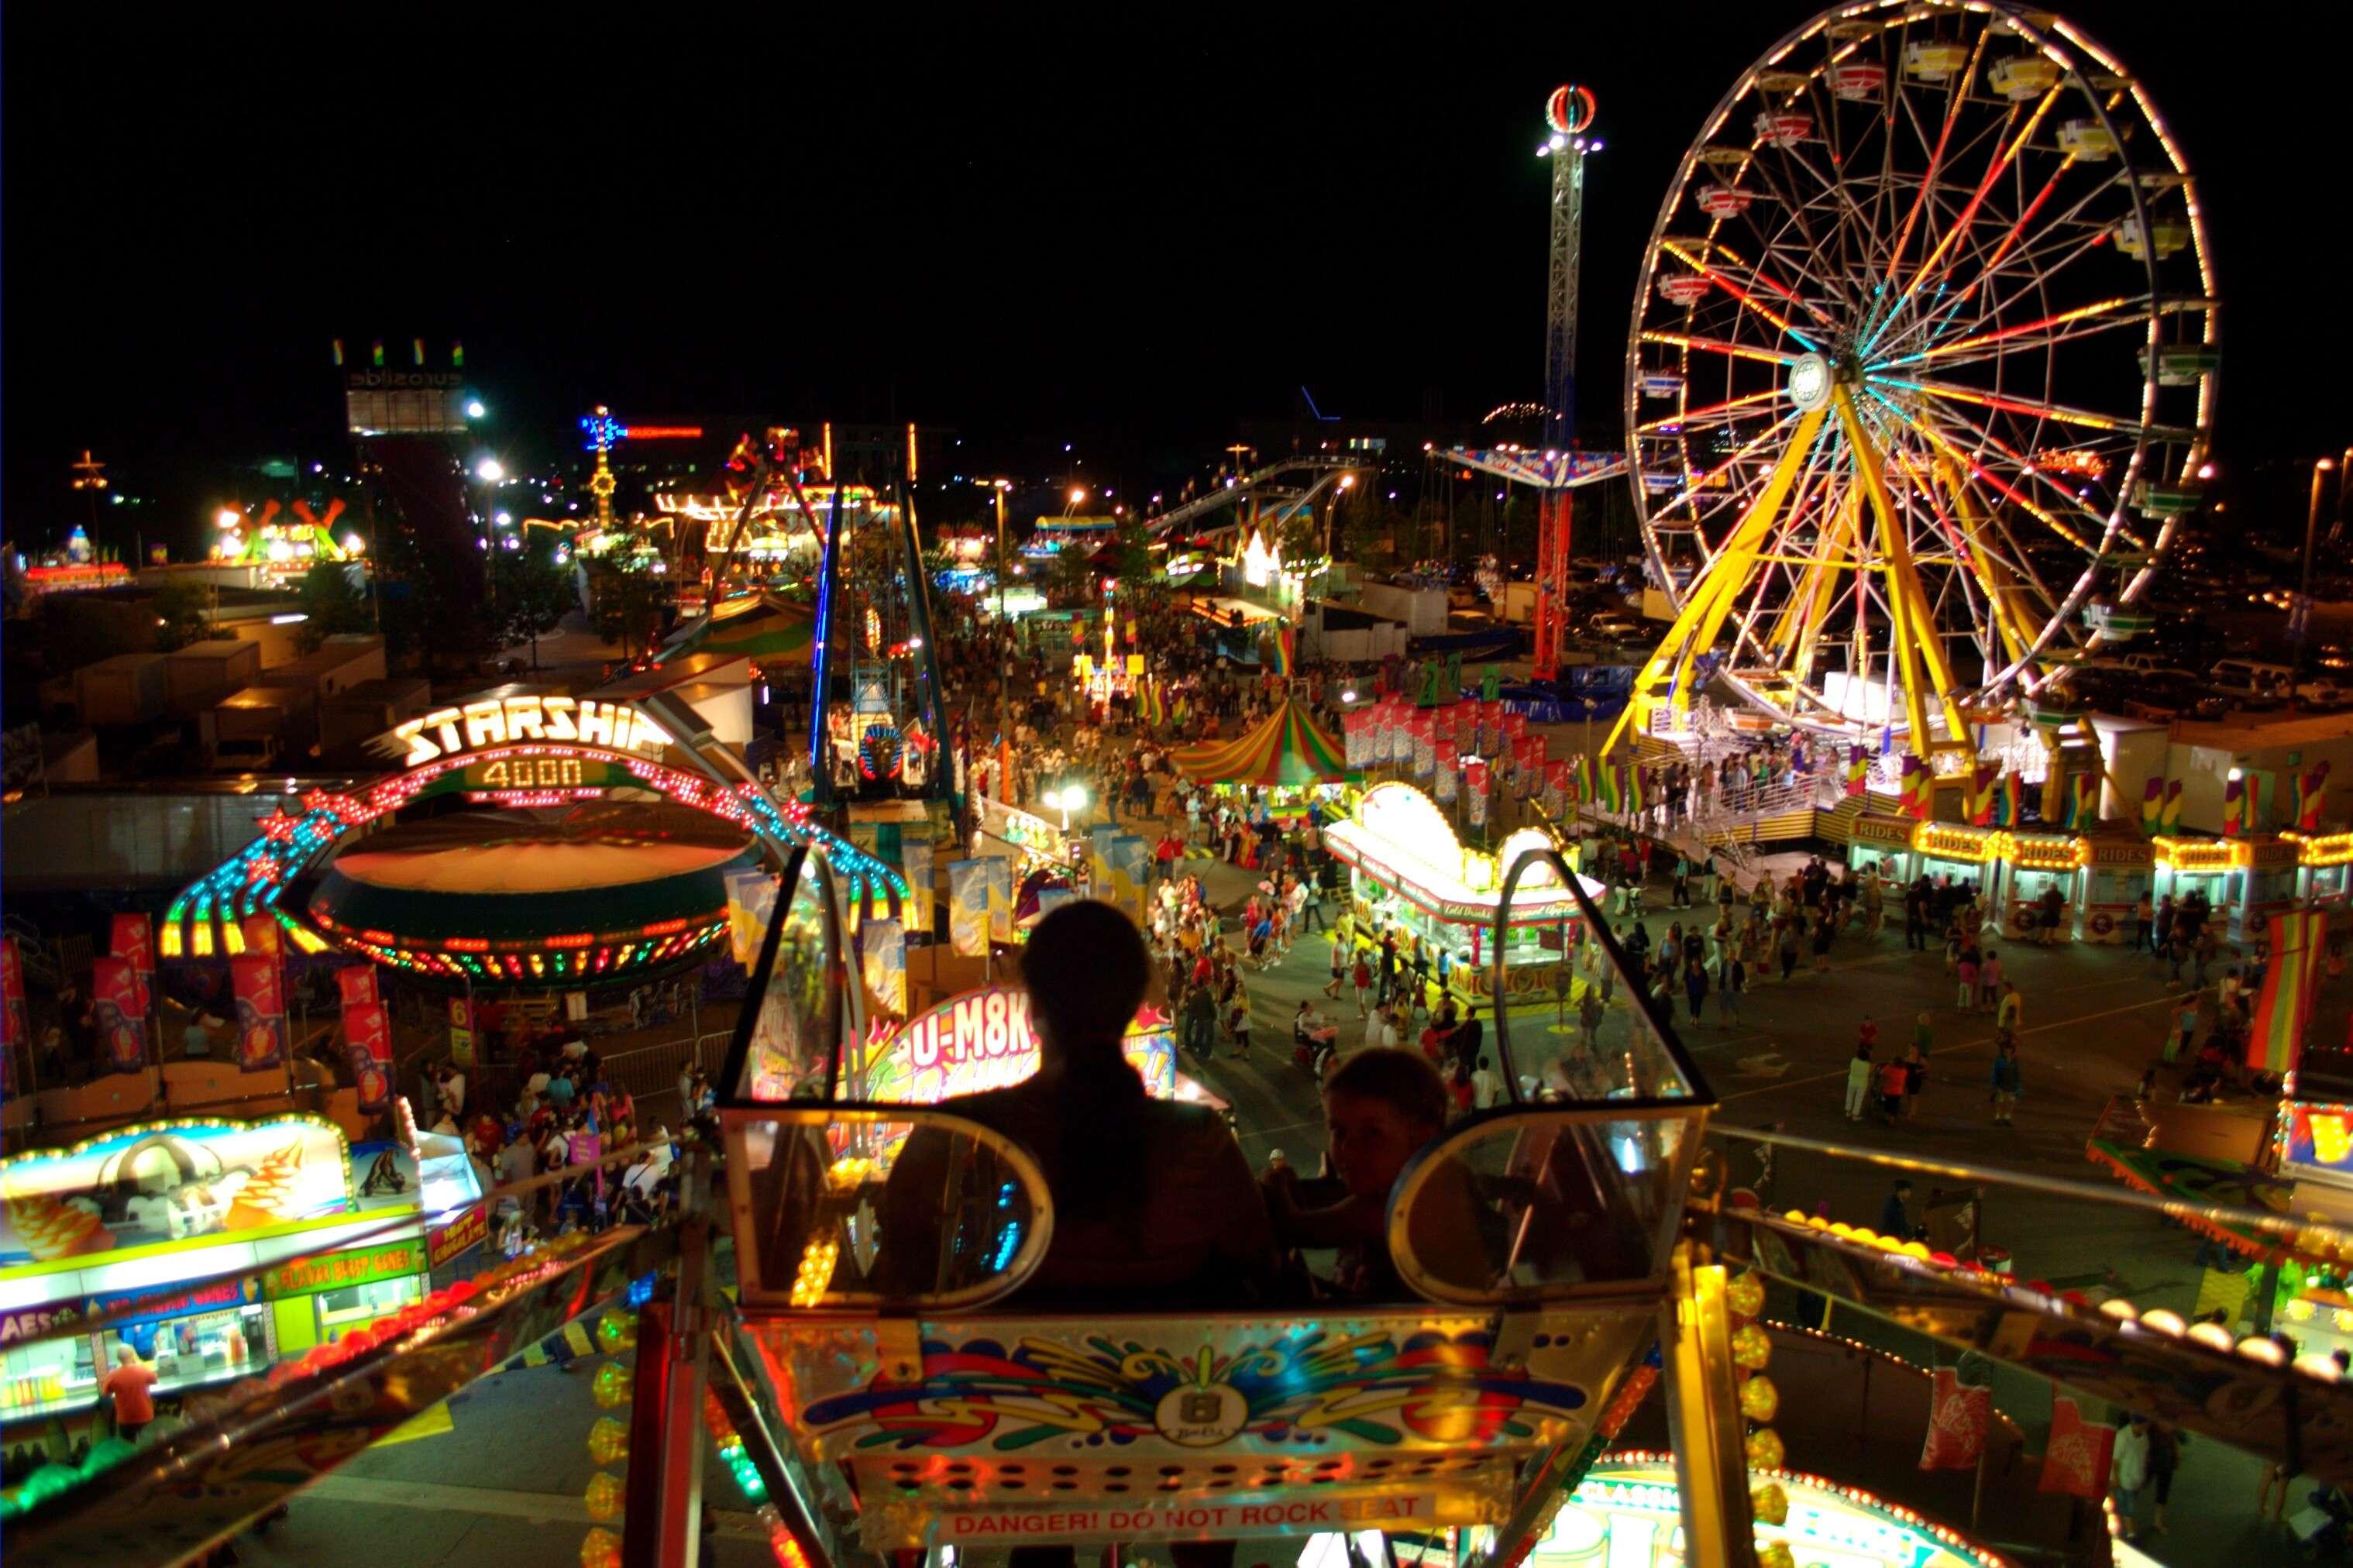 Amazing lighting and Ferris wheel